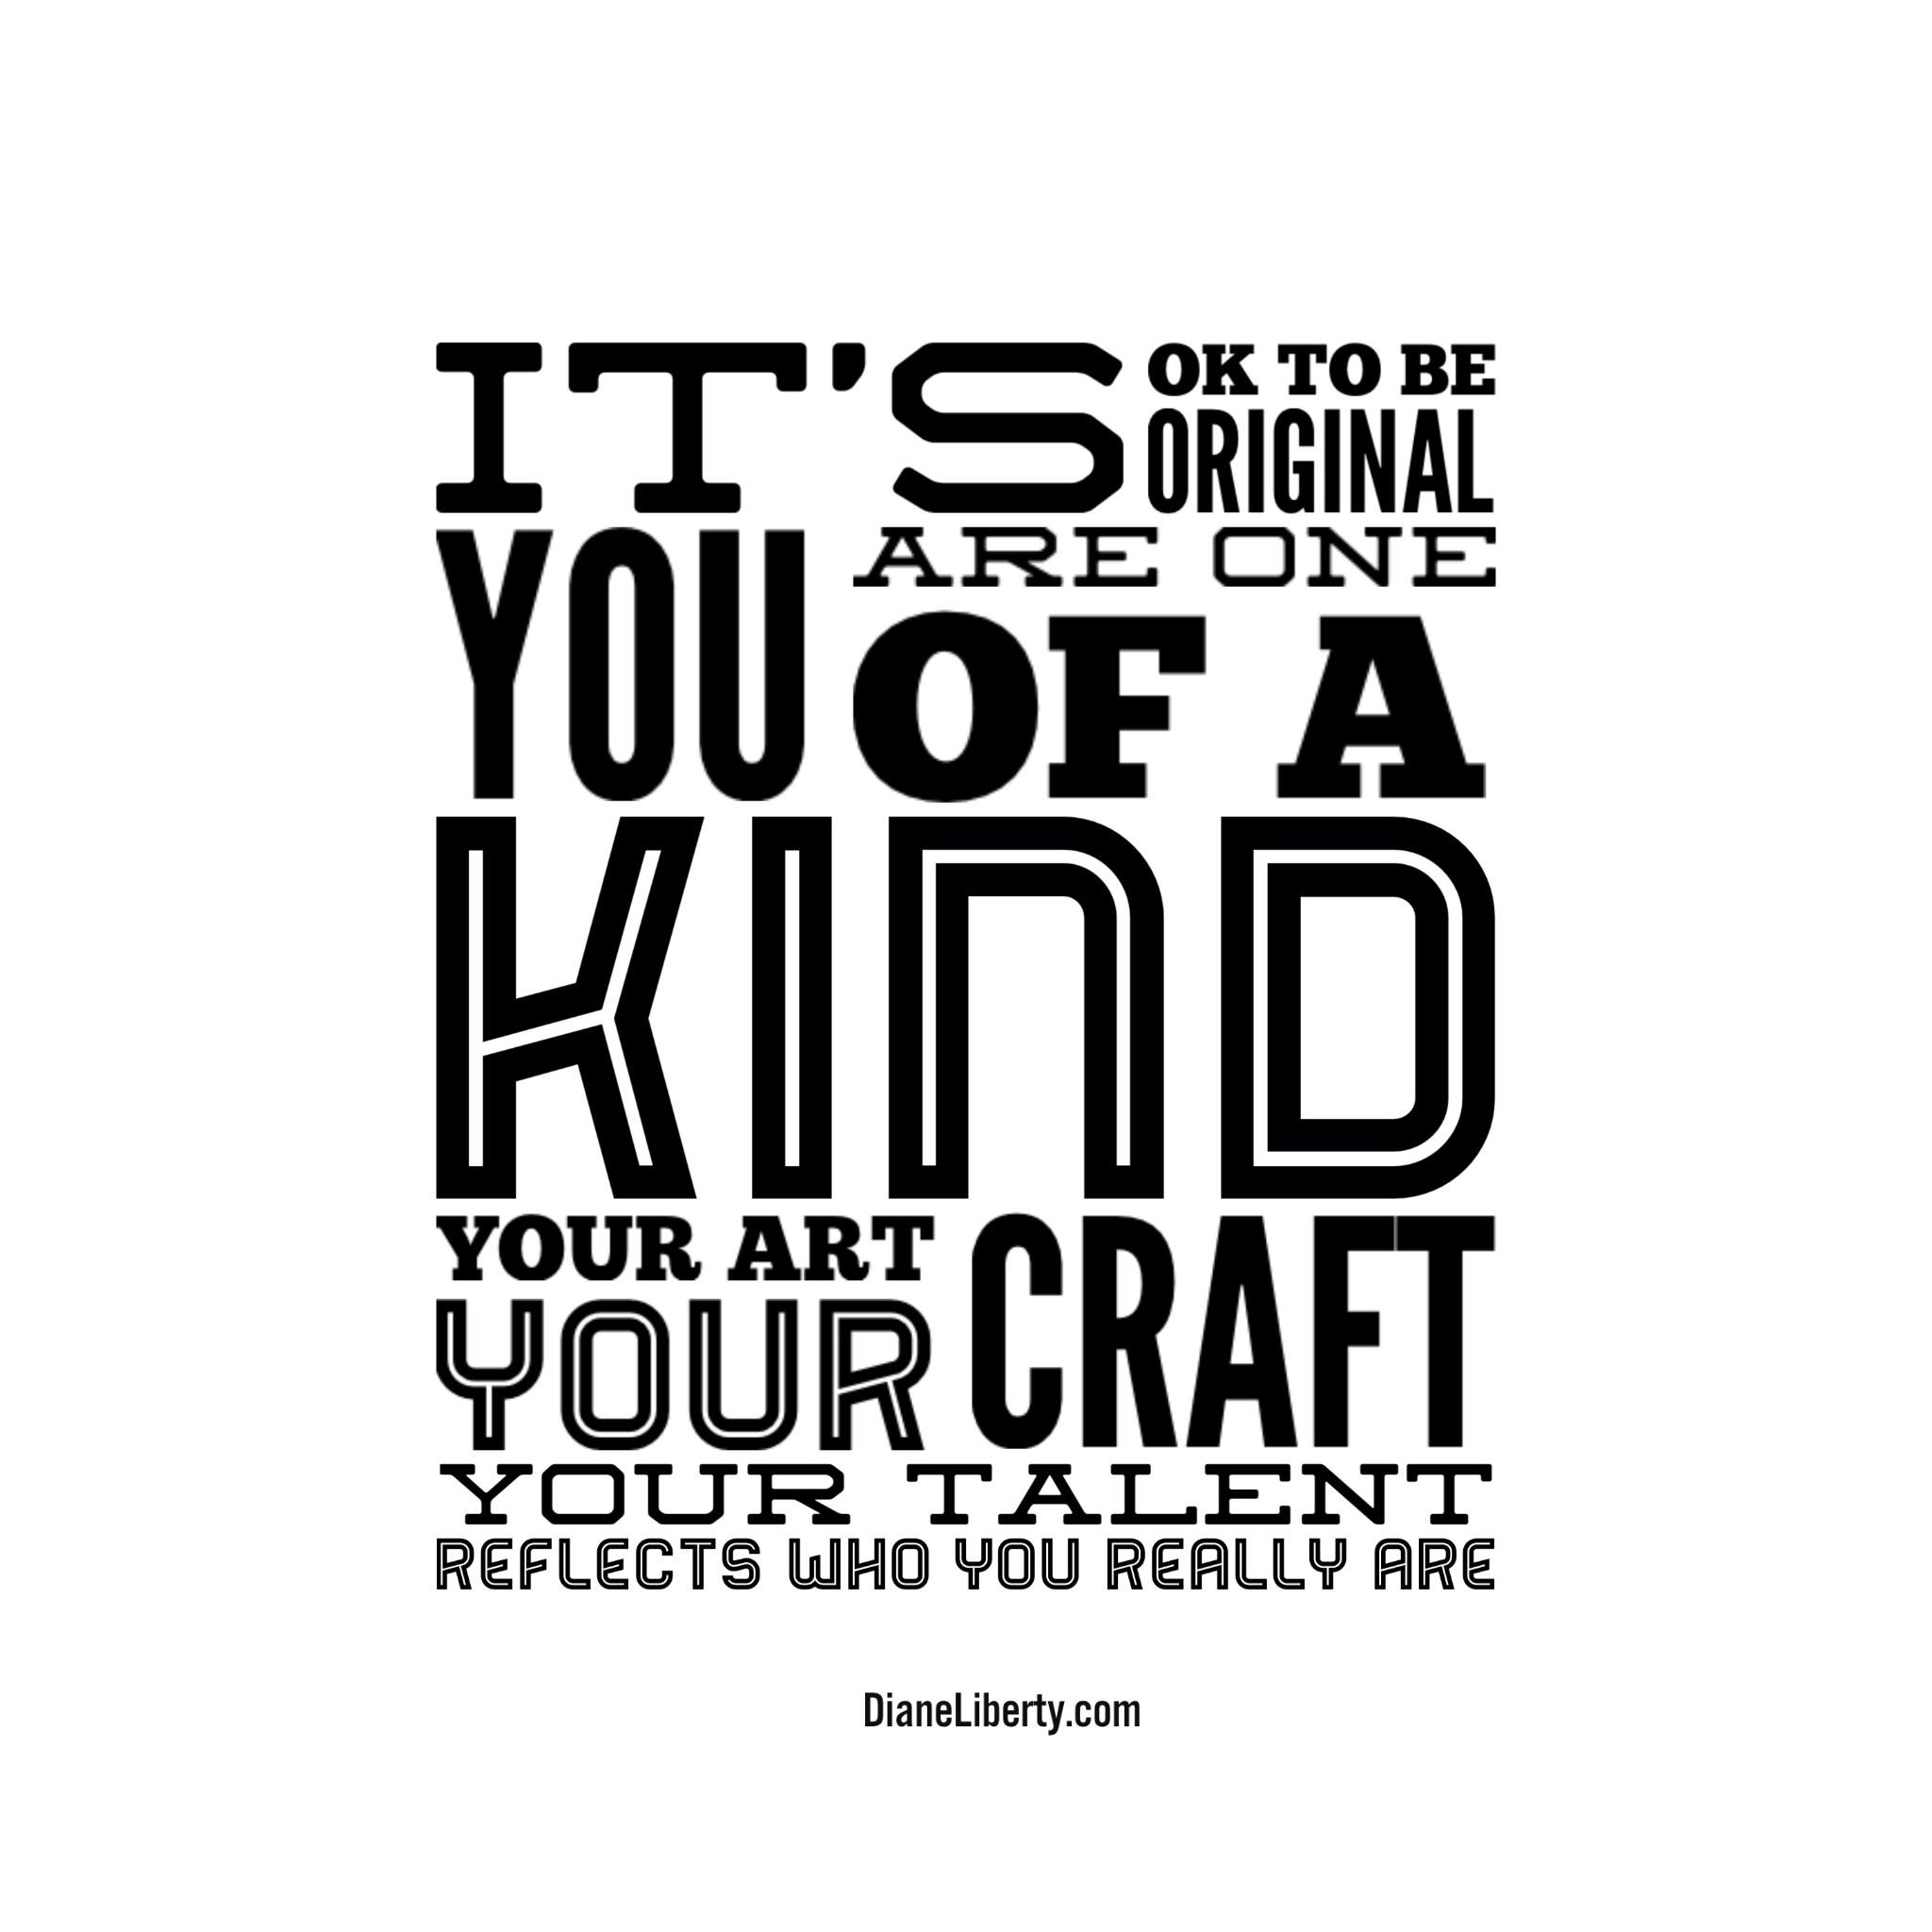 It's OK to be original